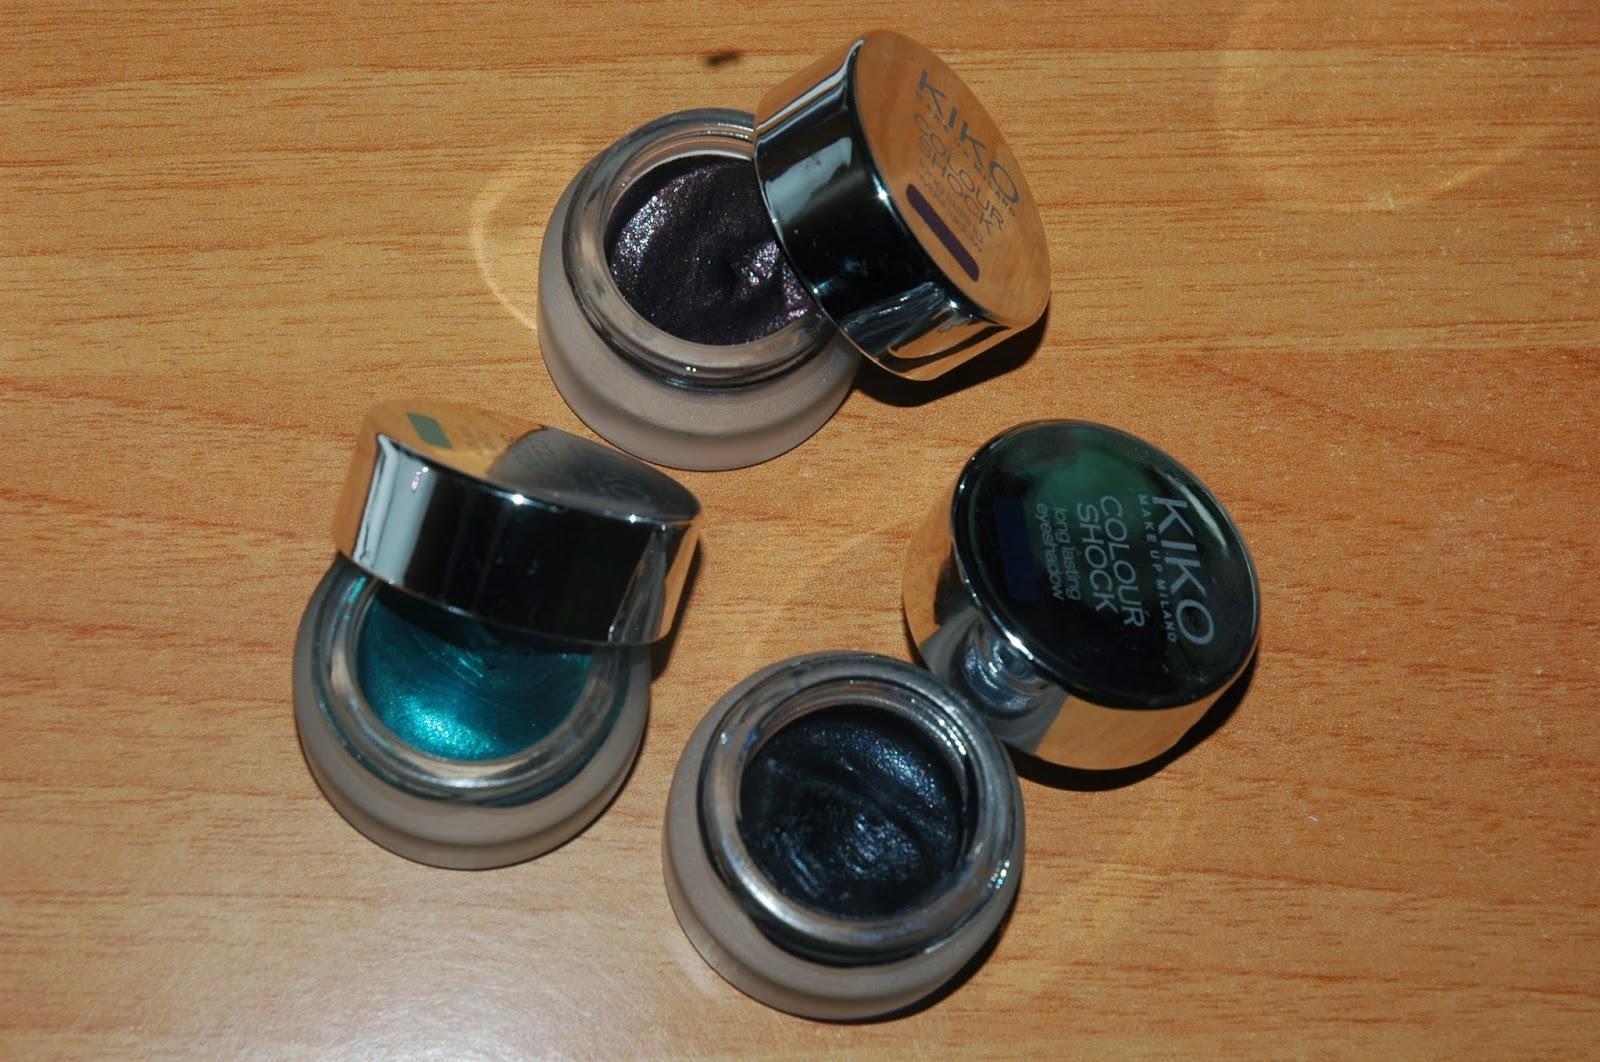 make up Kiko eyeshadow in cream